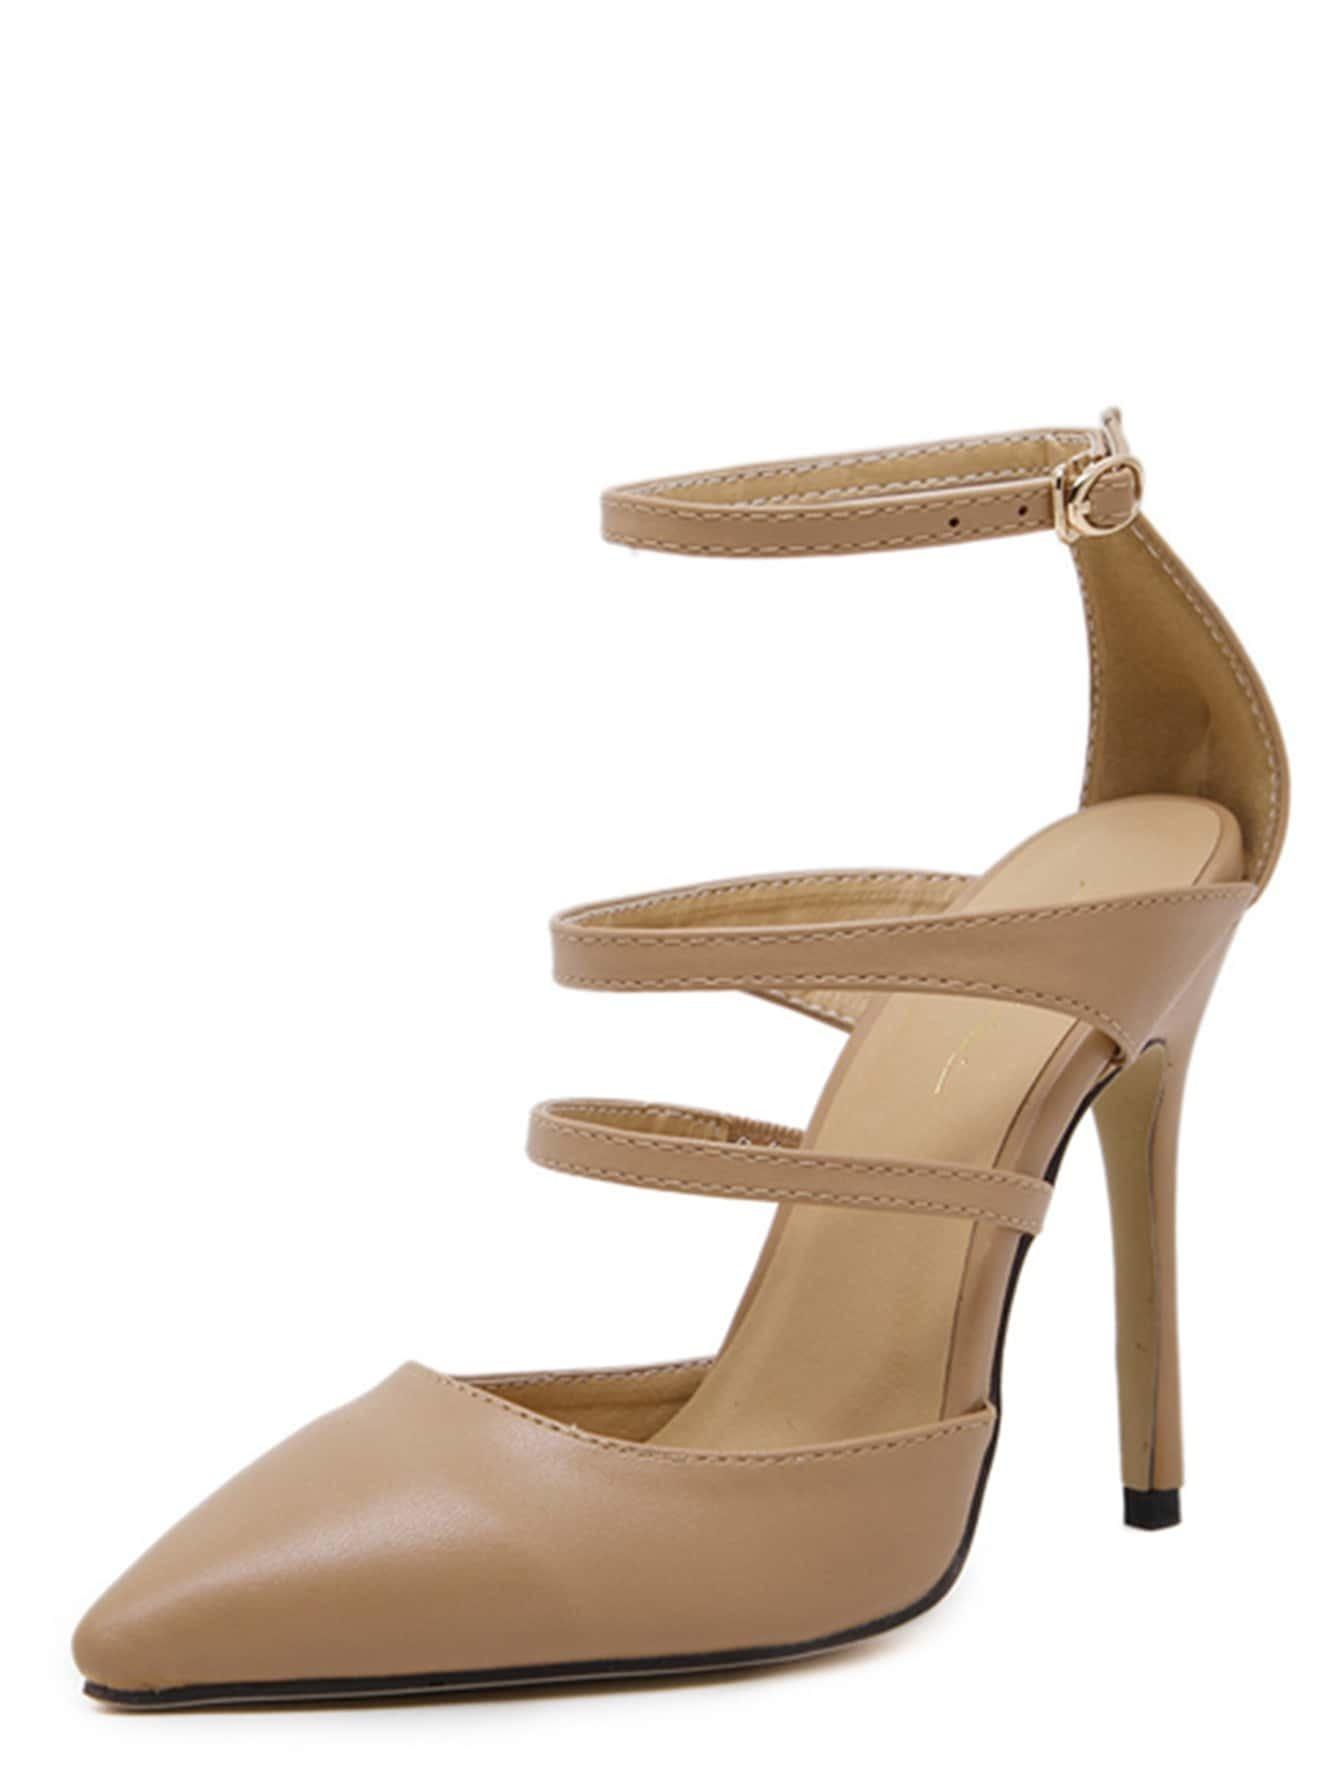 Chaussures talon en su d bout pointu abricot french for Acheter maison suede